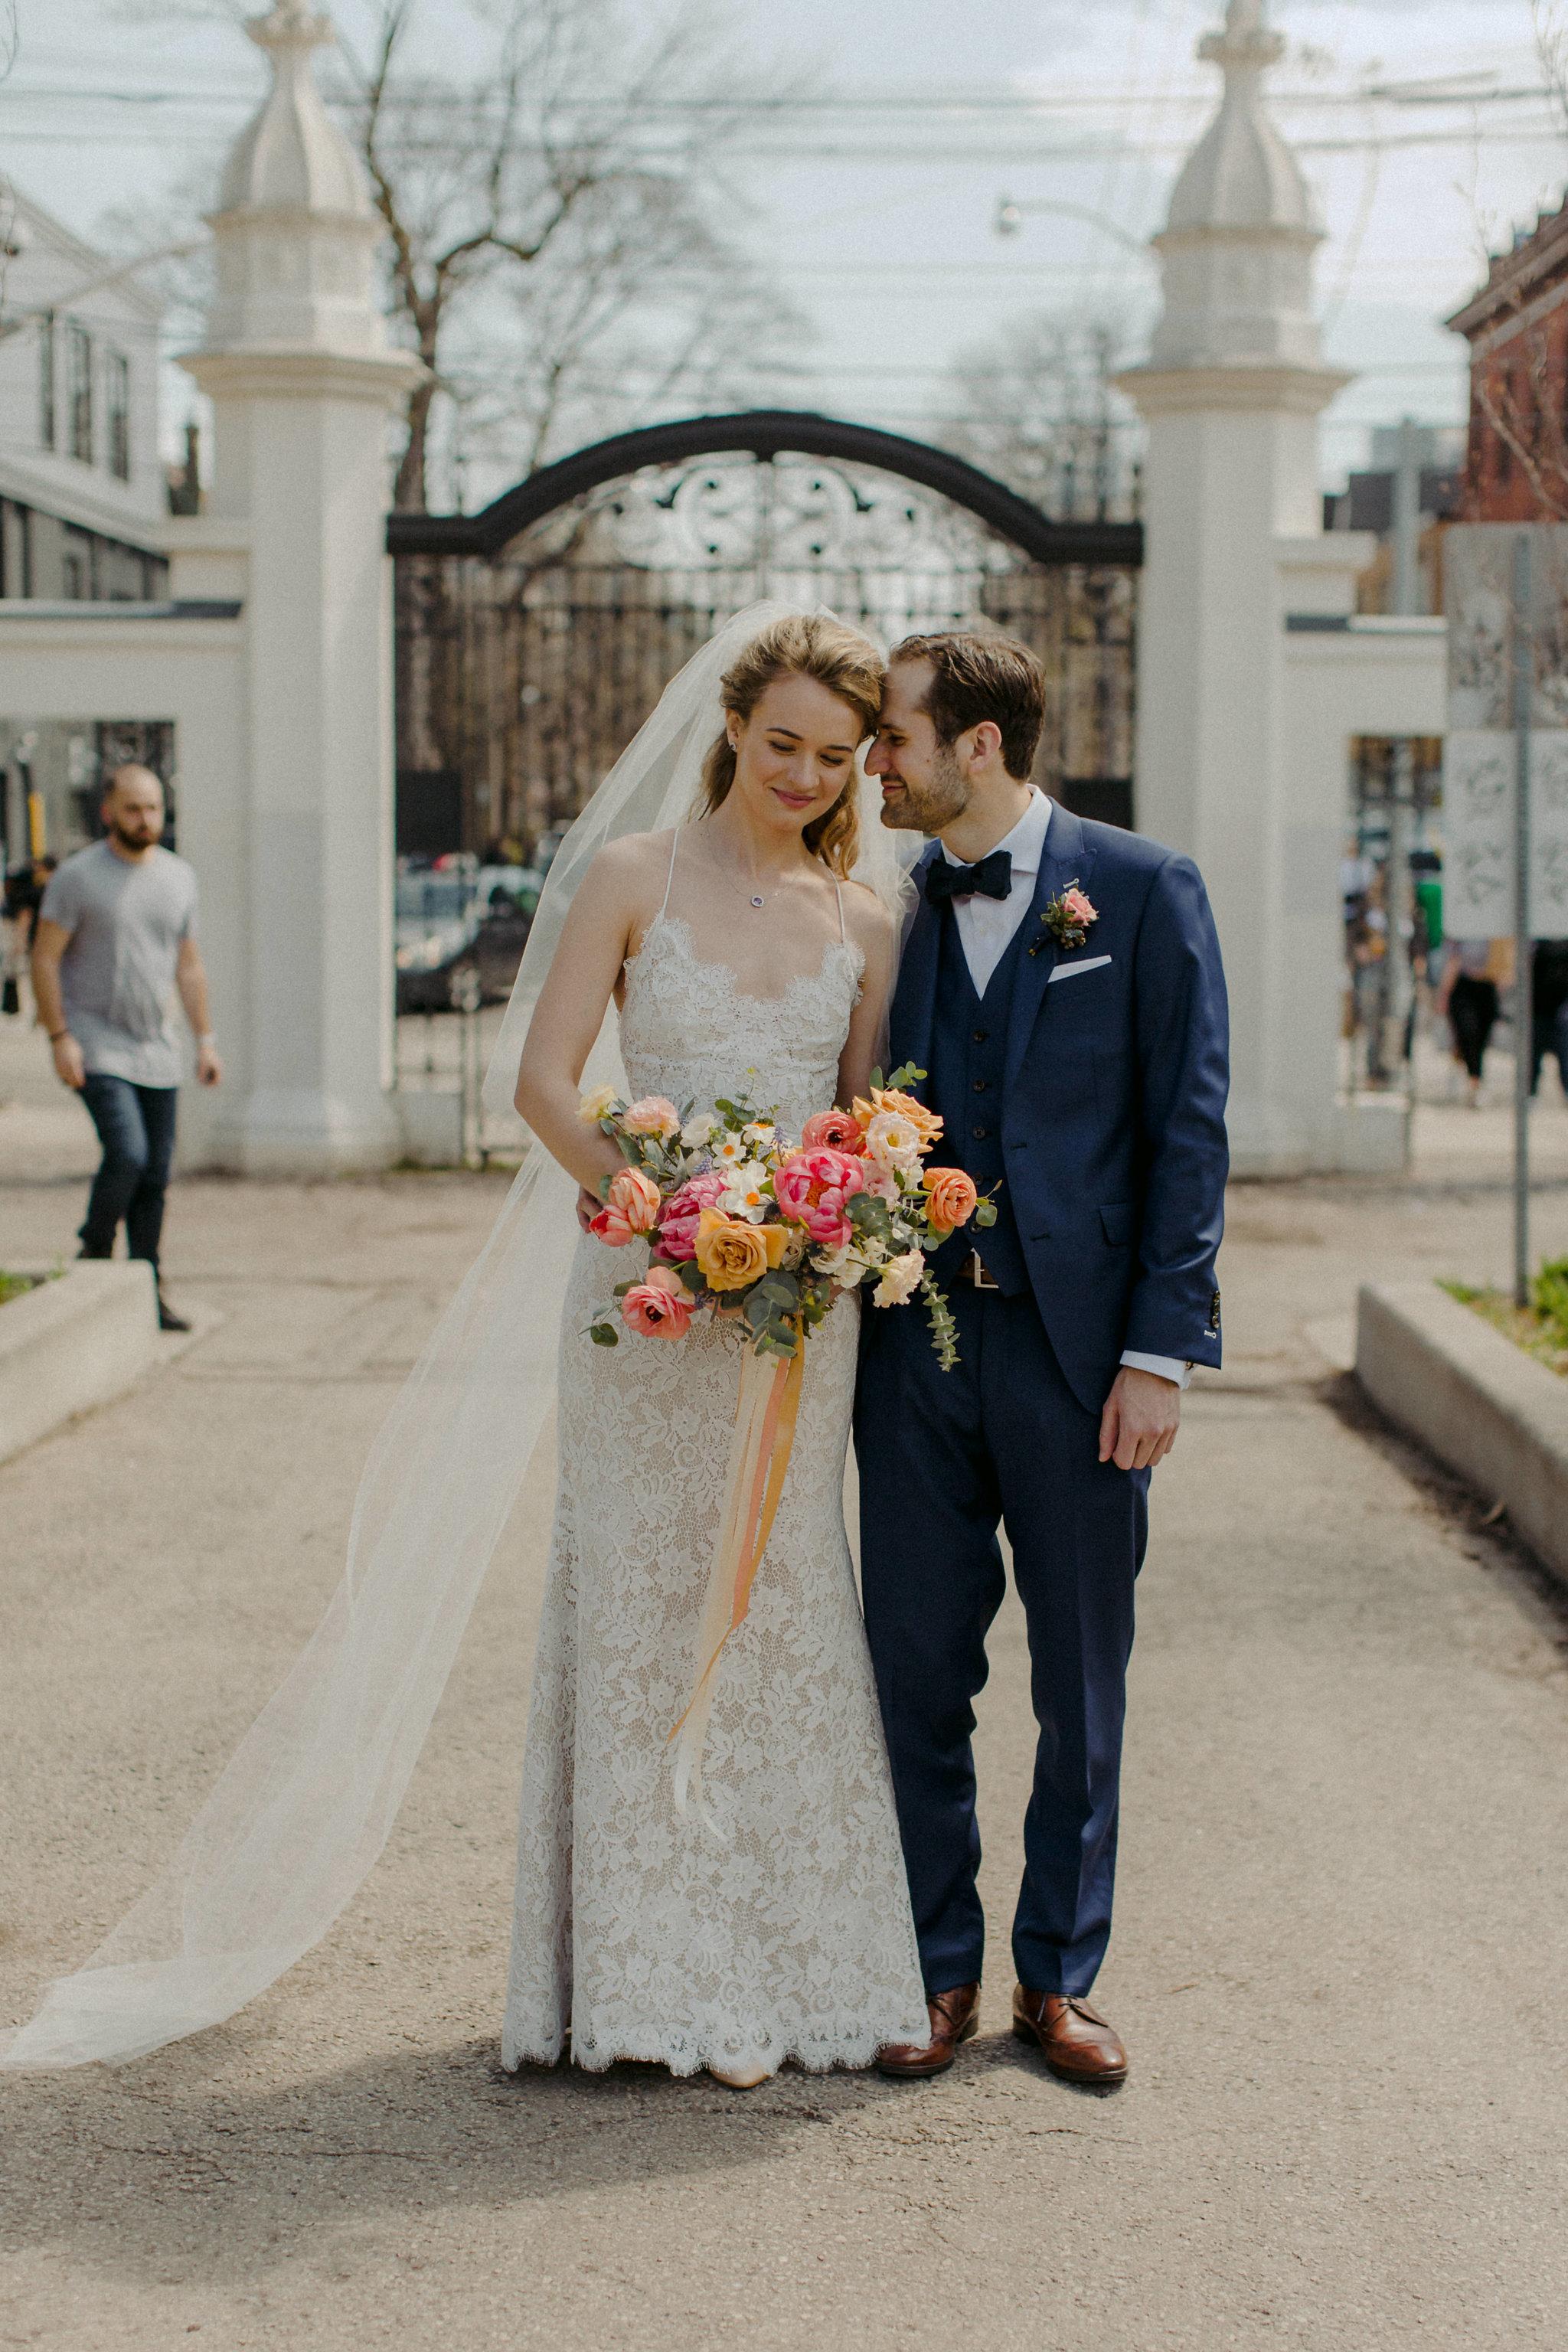 photo by Danijela Weddings